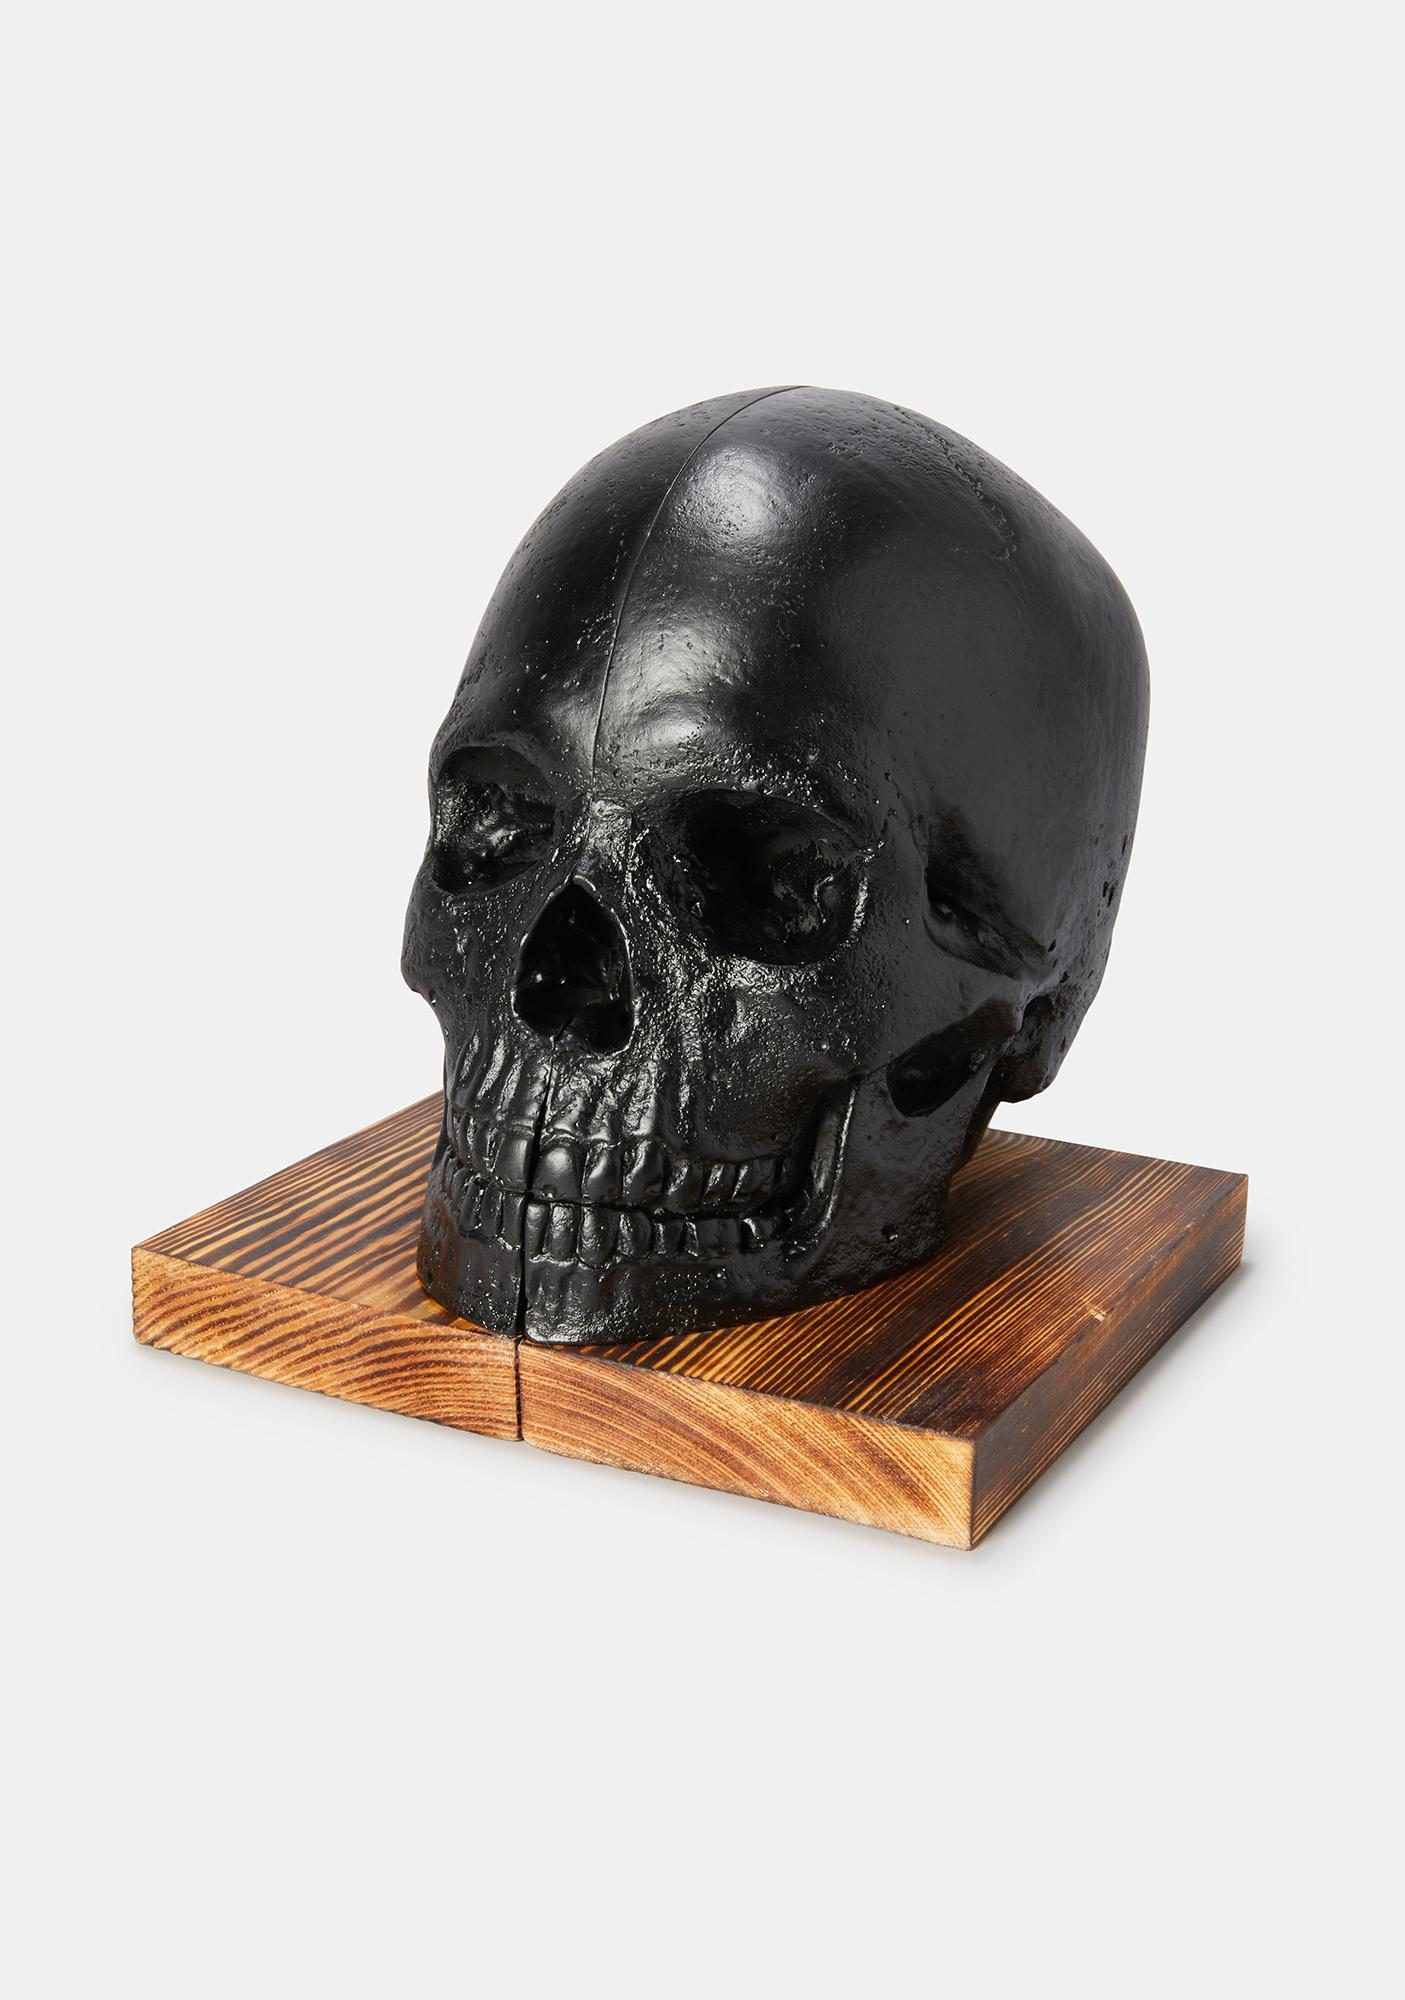 The Blackened Teeth Skull Bookends